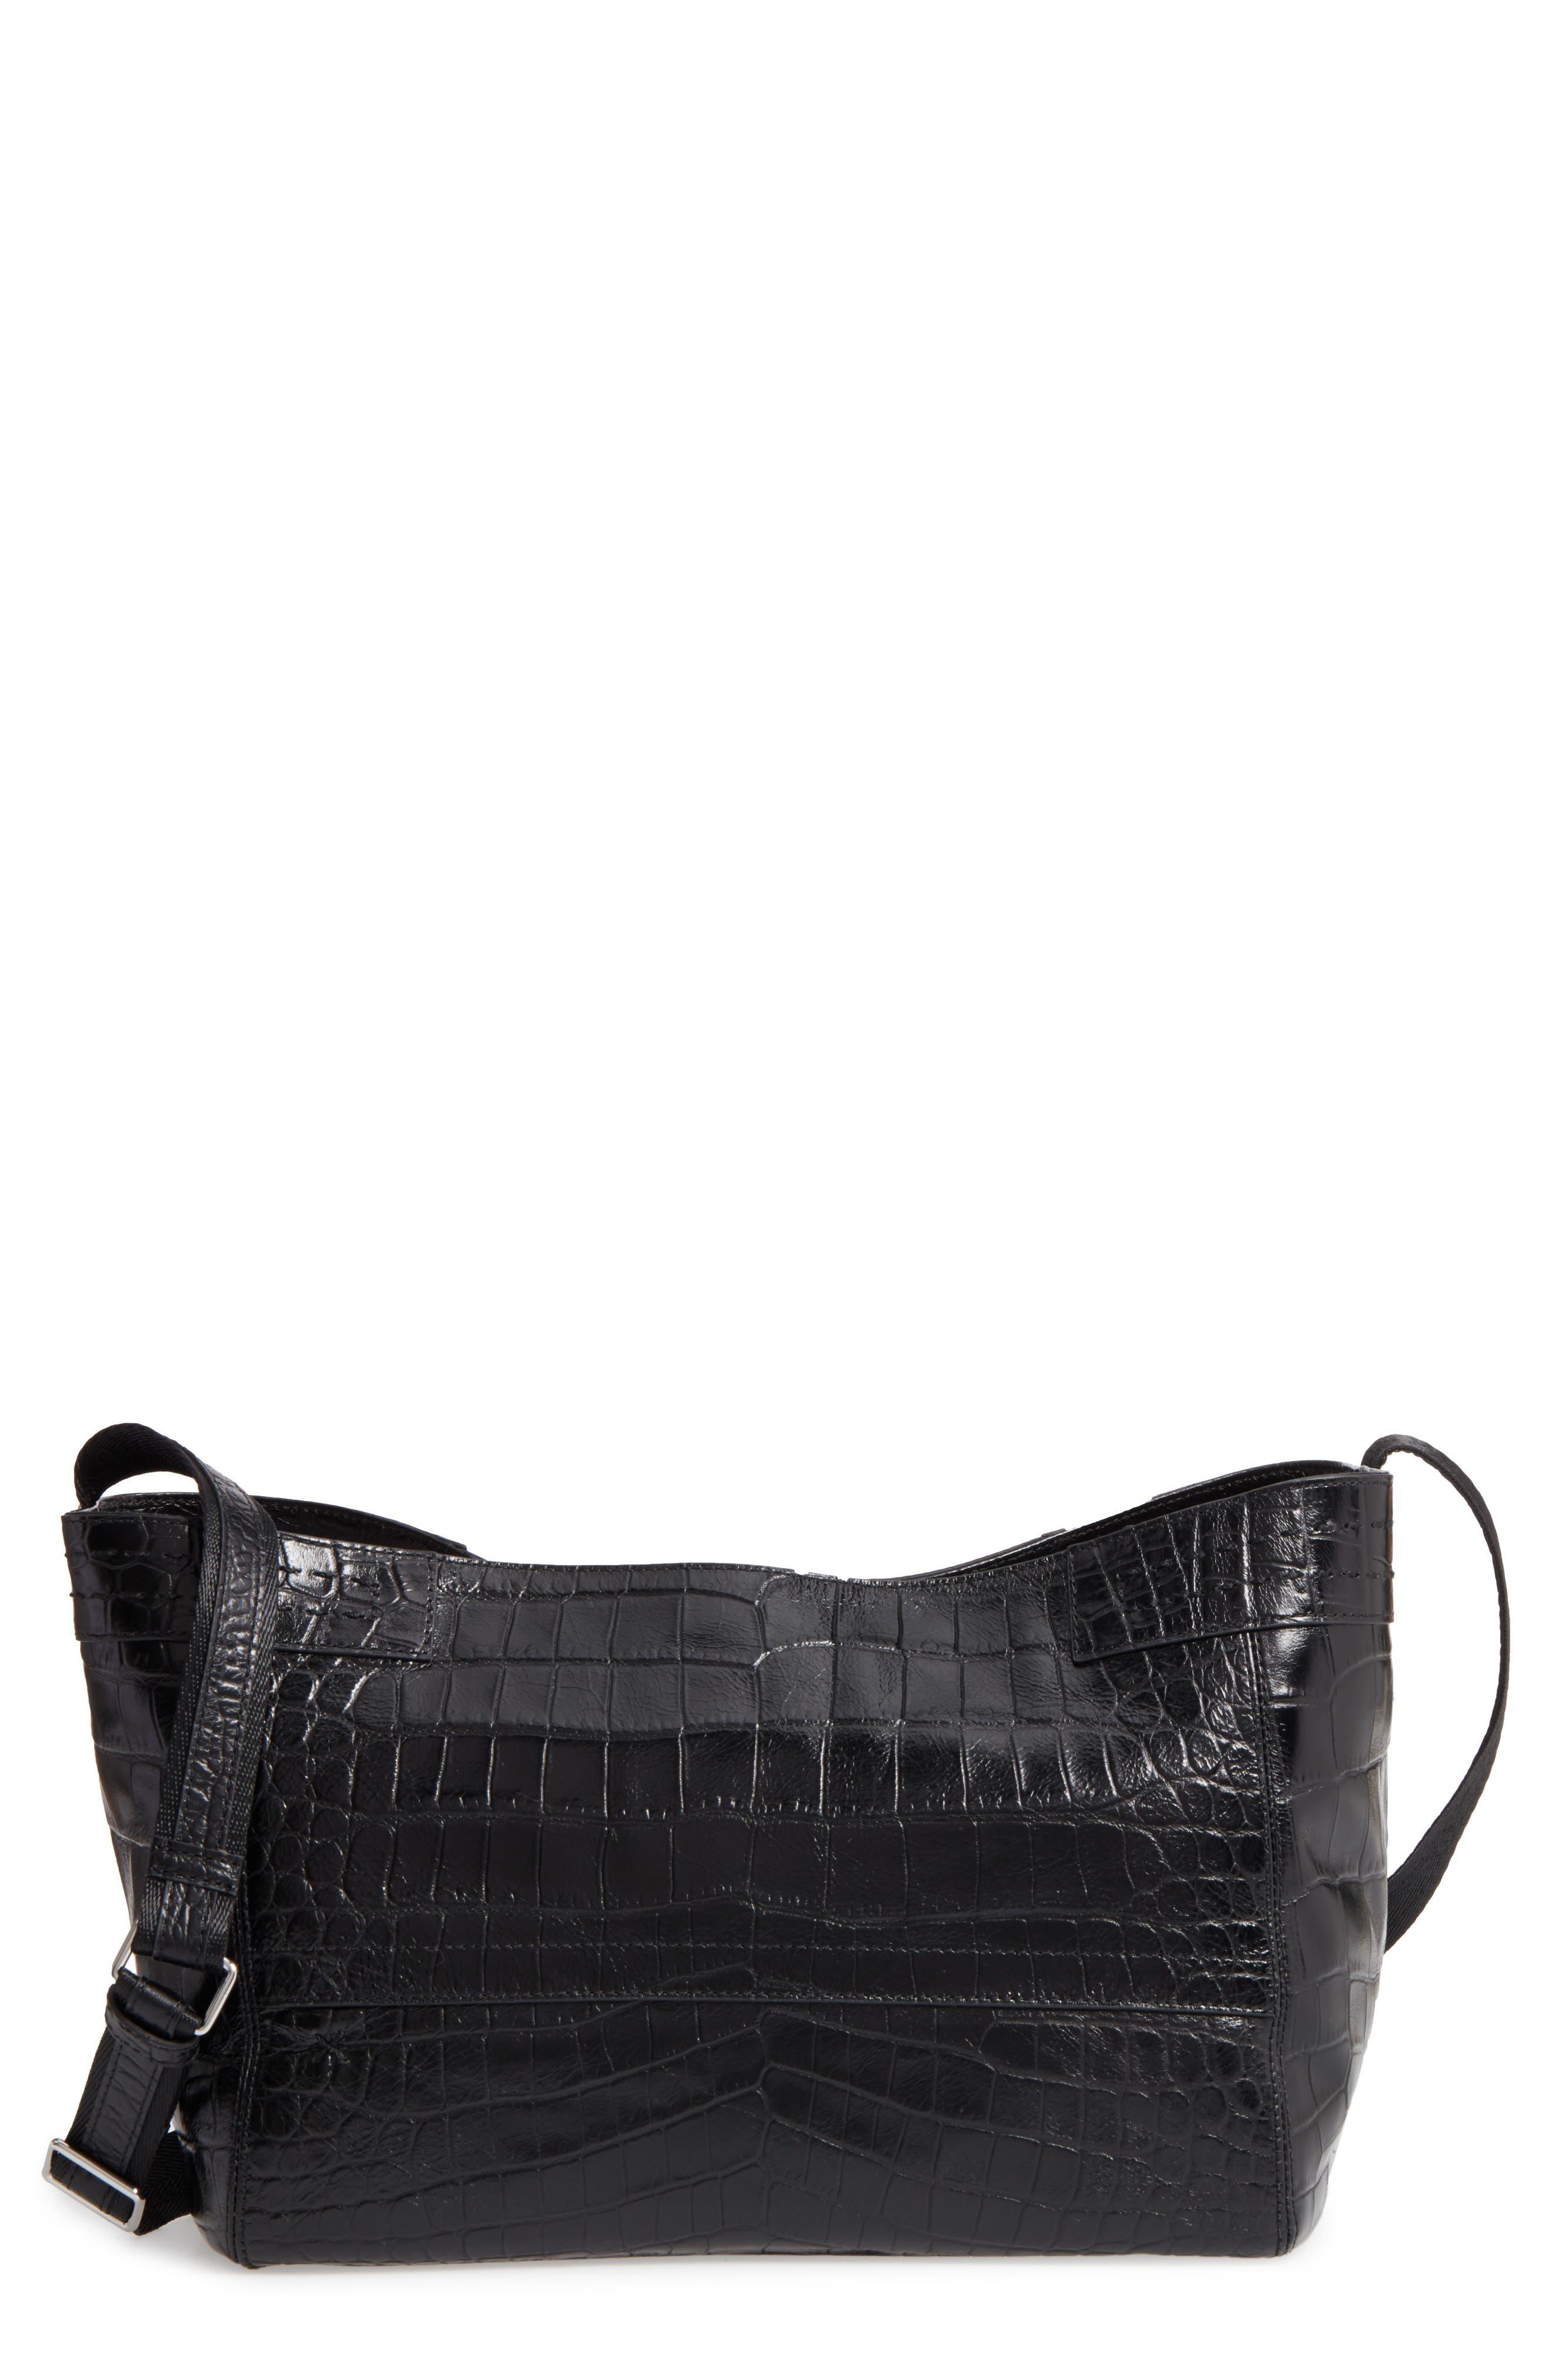 Main Image - Elizabeth and James Mini Keely Newspaper Croc Embossed Leather Shoulder/Crossbody Bag